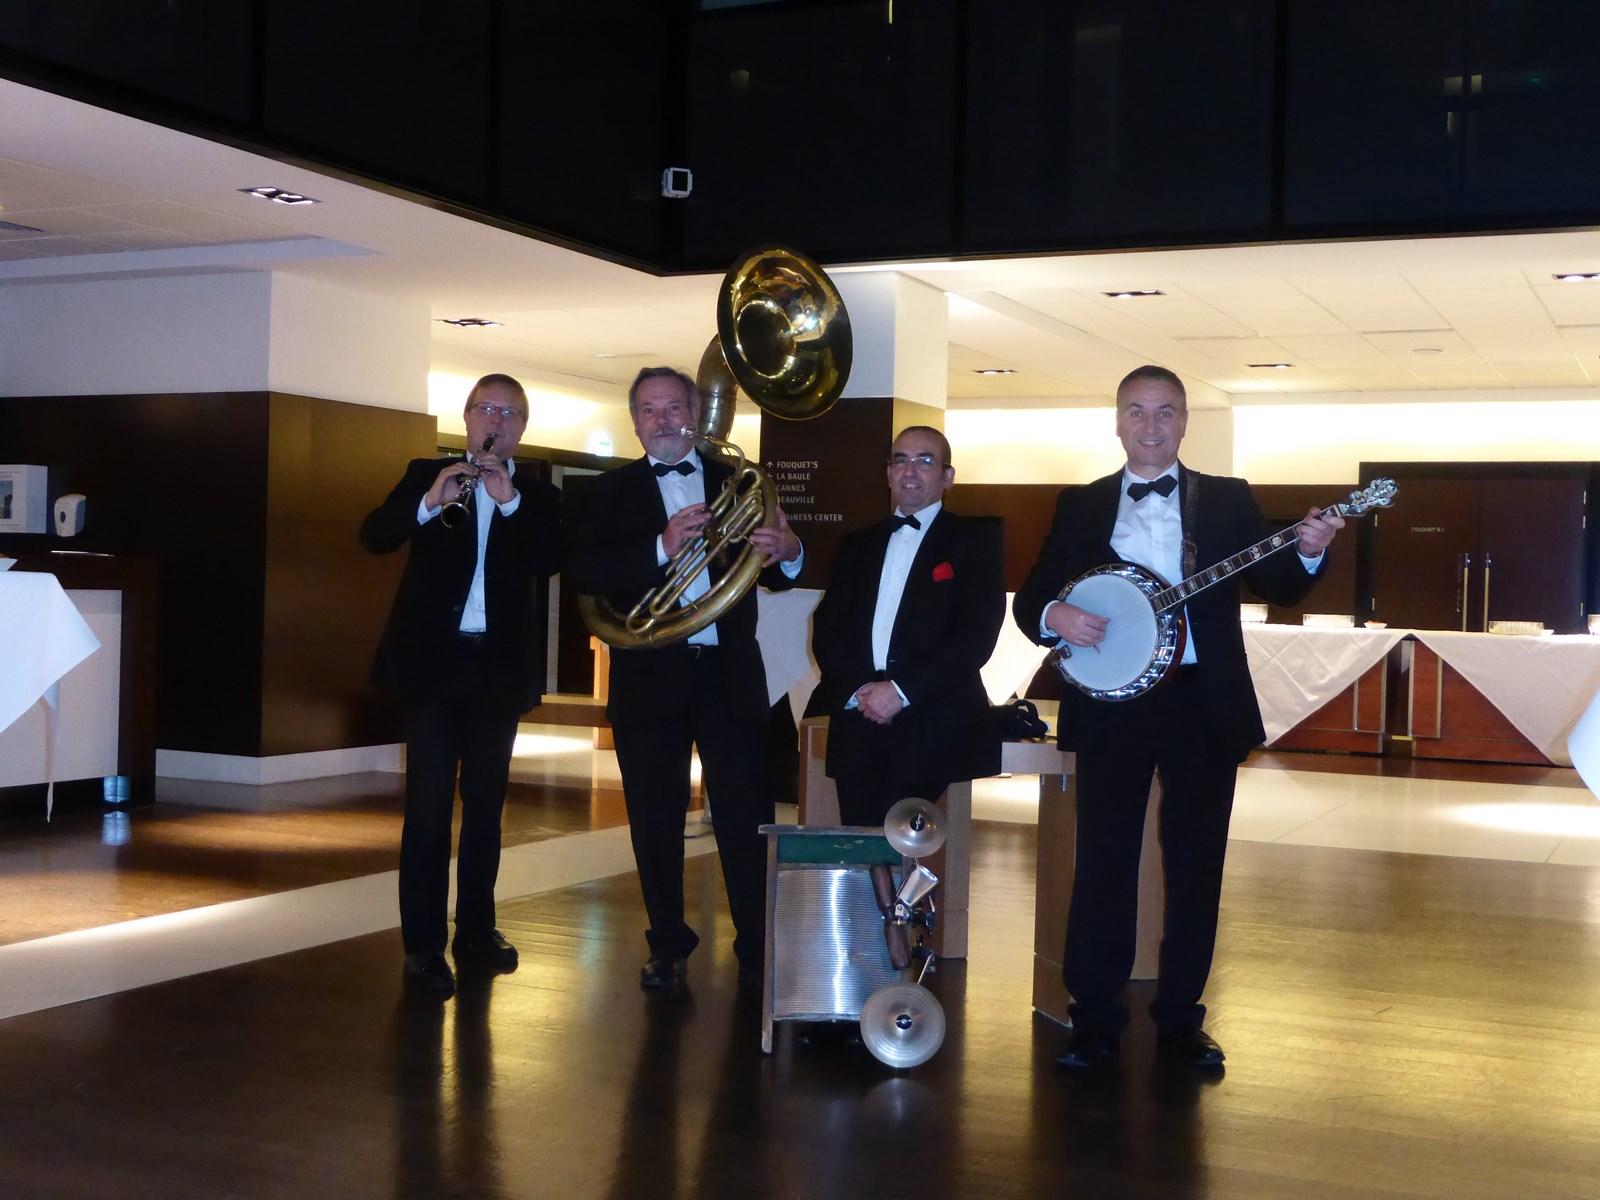 orchestre jazz gatsby années folles